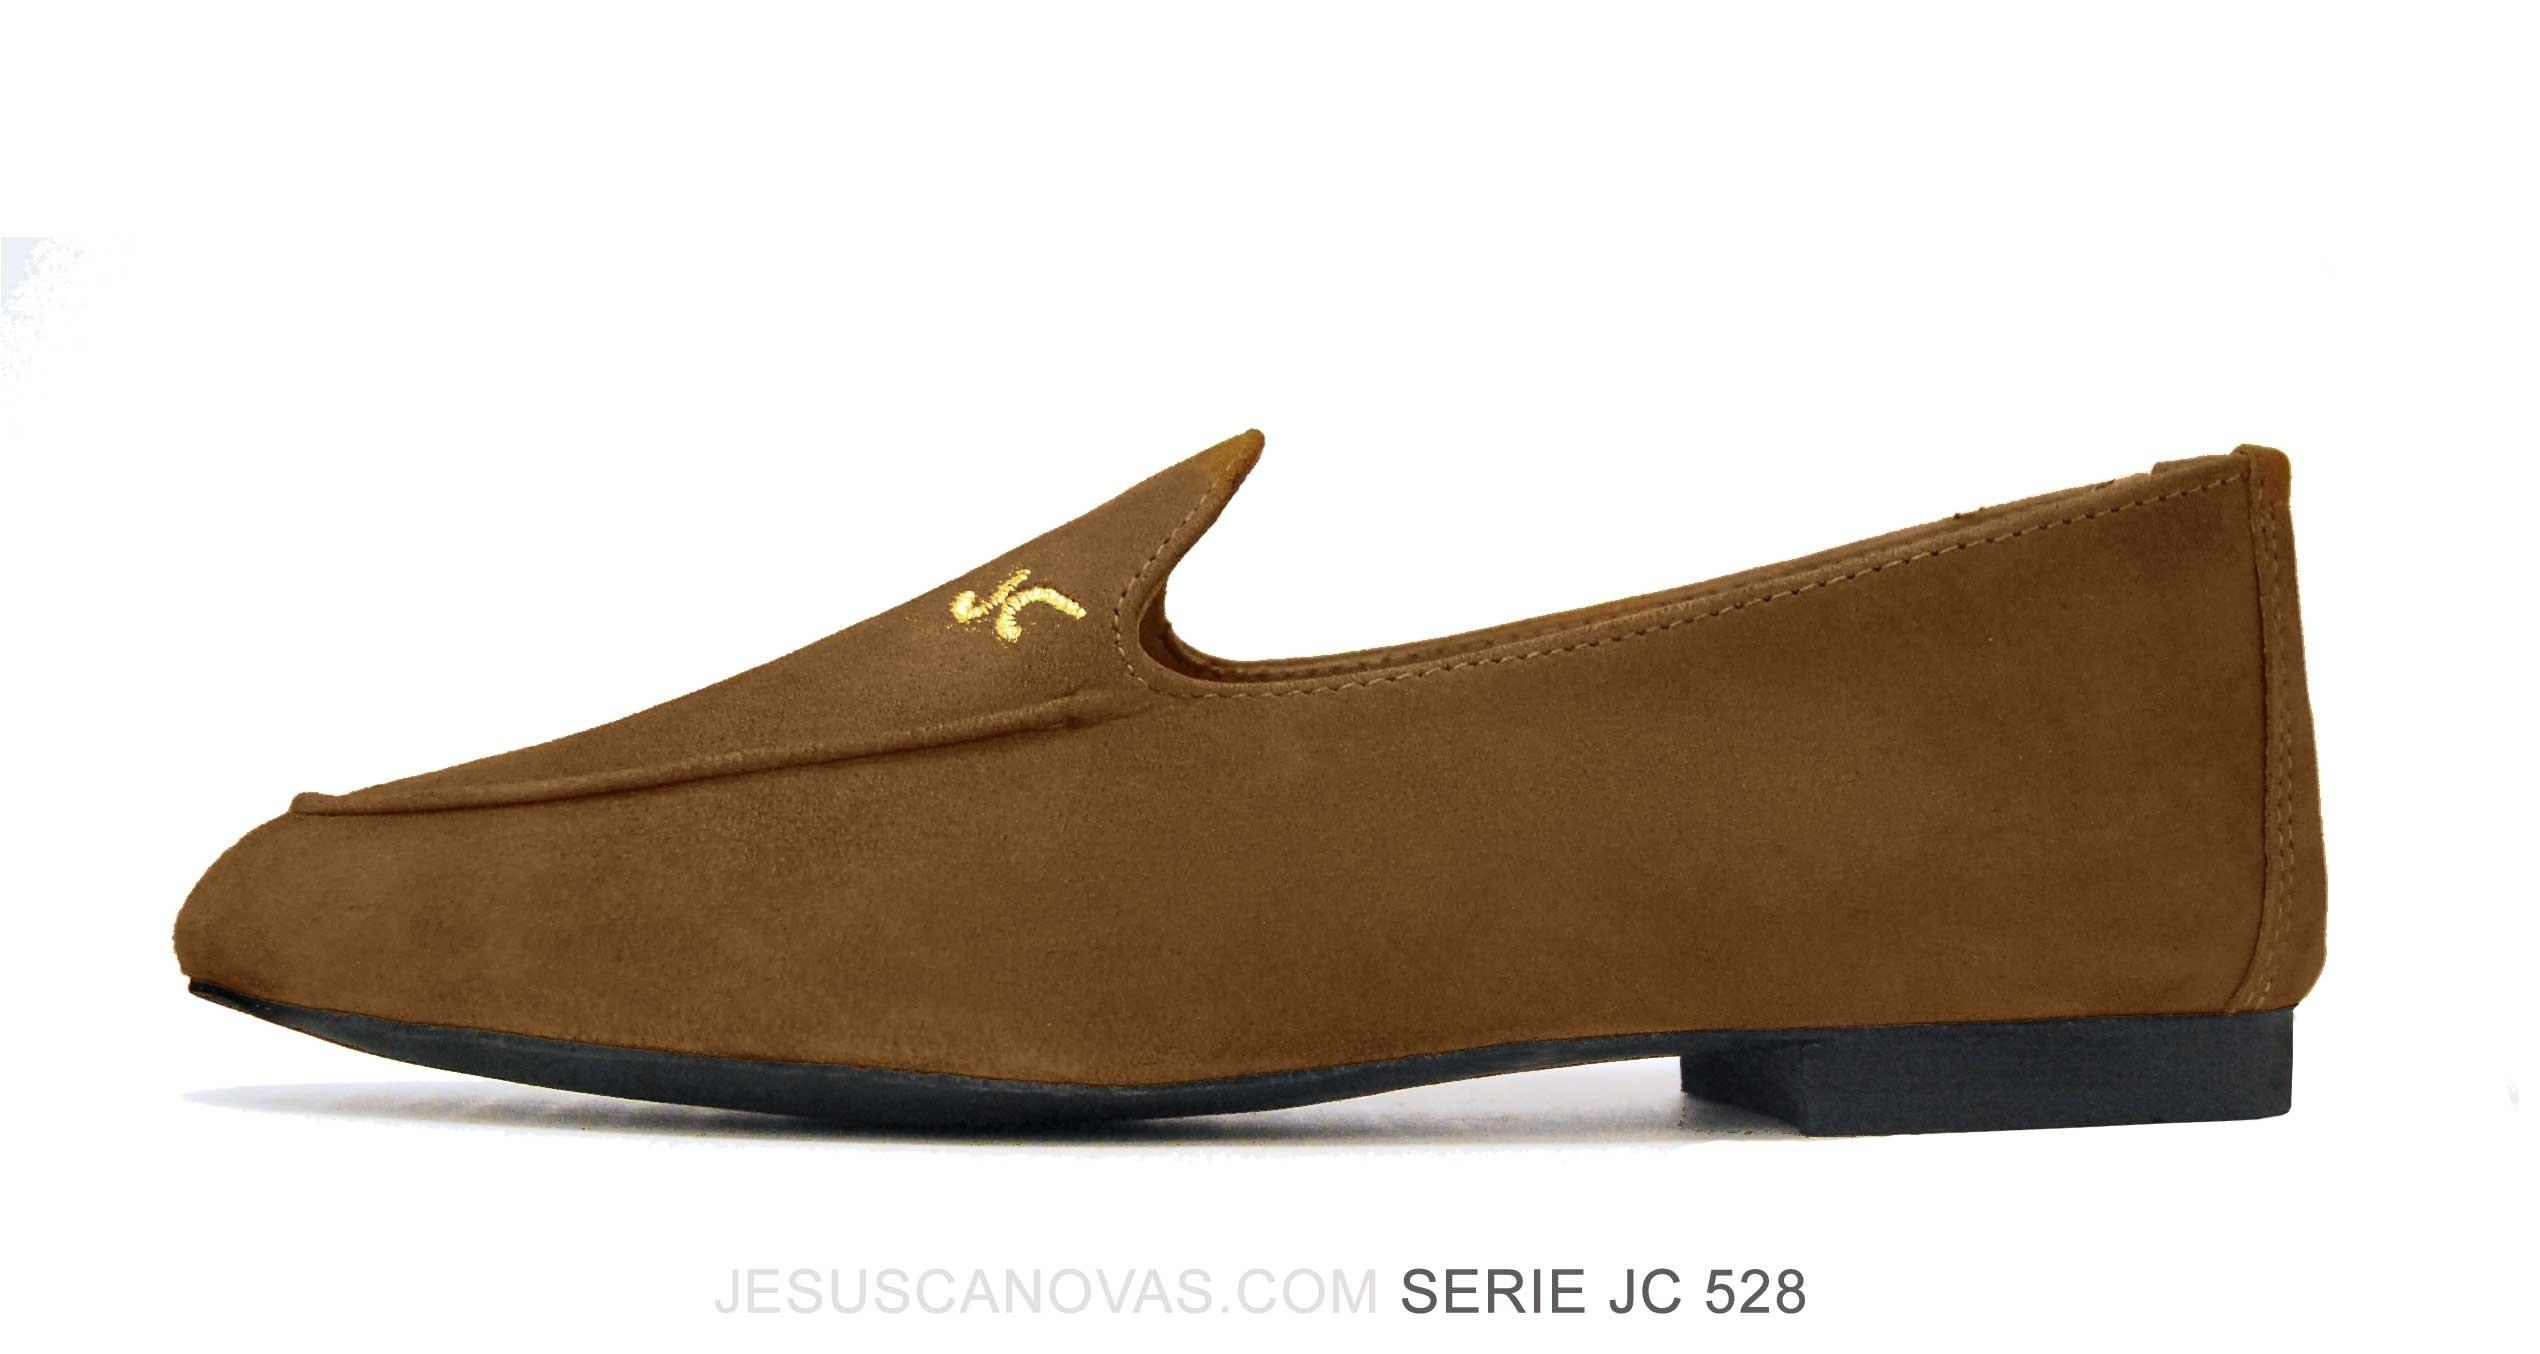 Foto 1 de Zapatos Julio Iglesias Mocasin Sakara ante